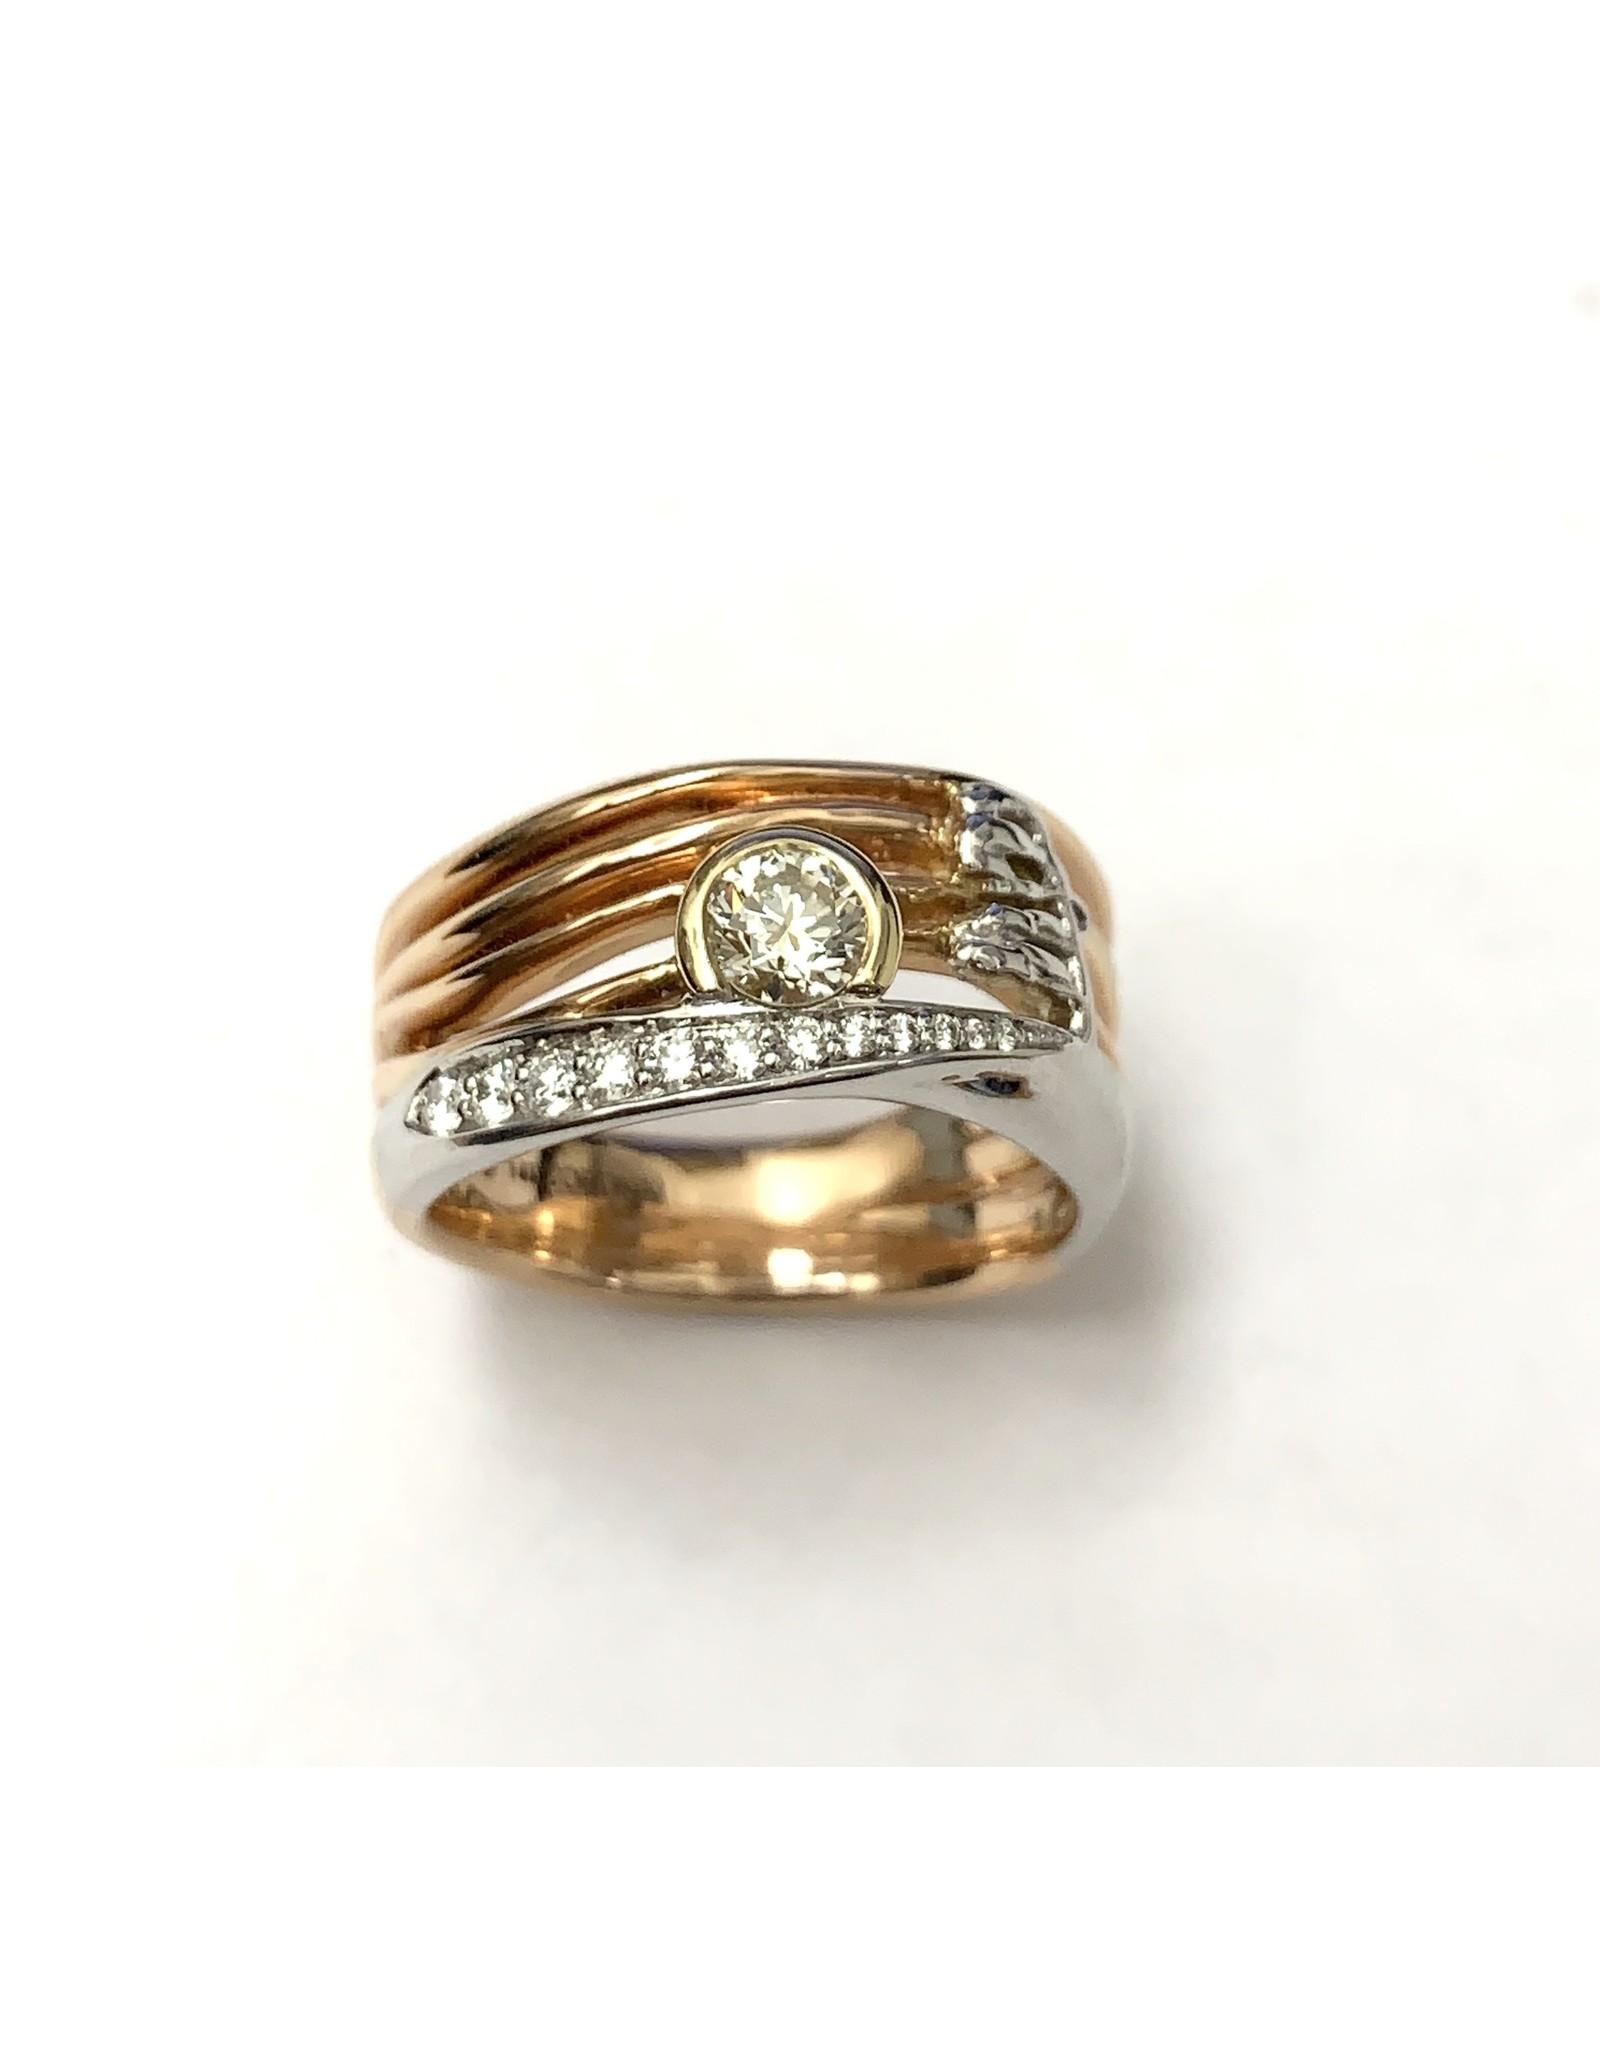 Canadian Sunset Diamond Ring 14KRWY